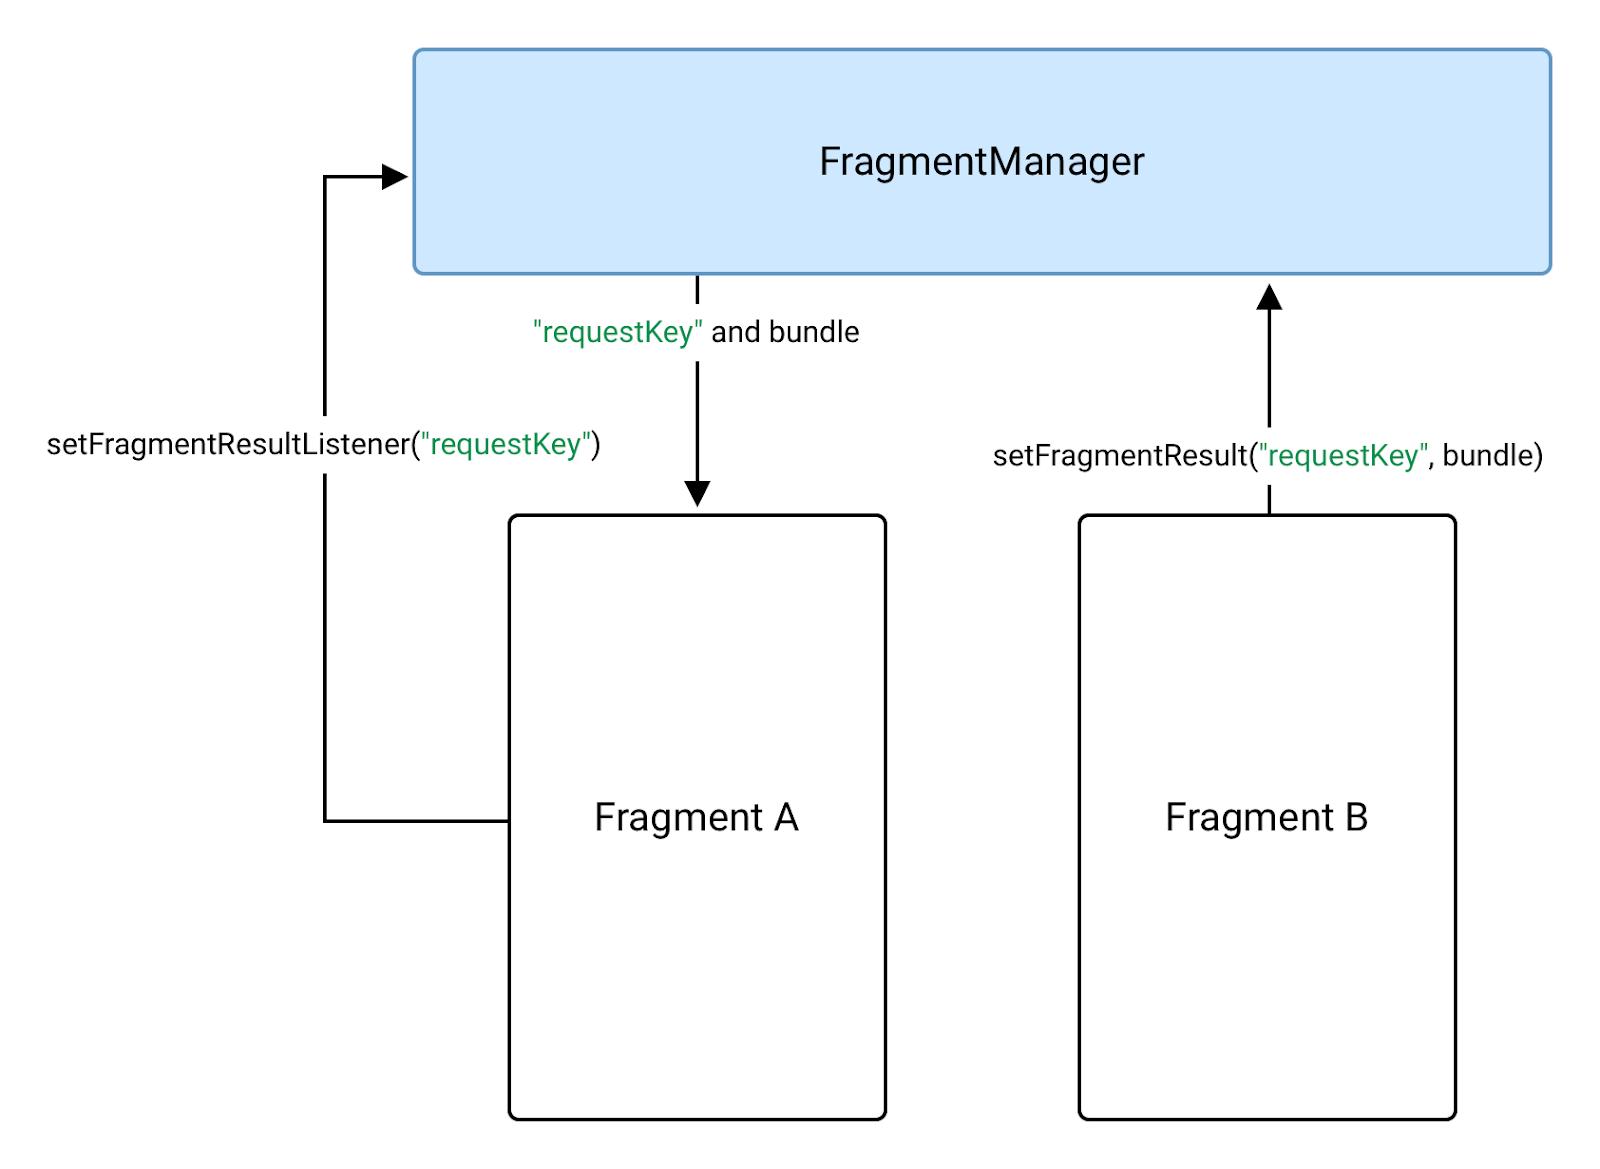 Fragment B 使用 FragmentManager 将数据发送到 Fragment A